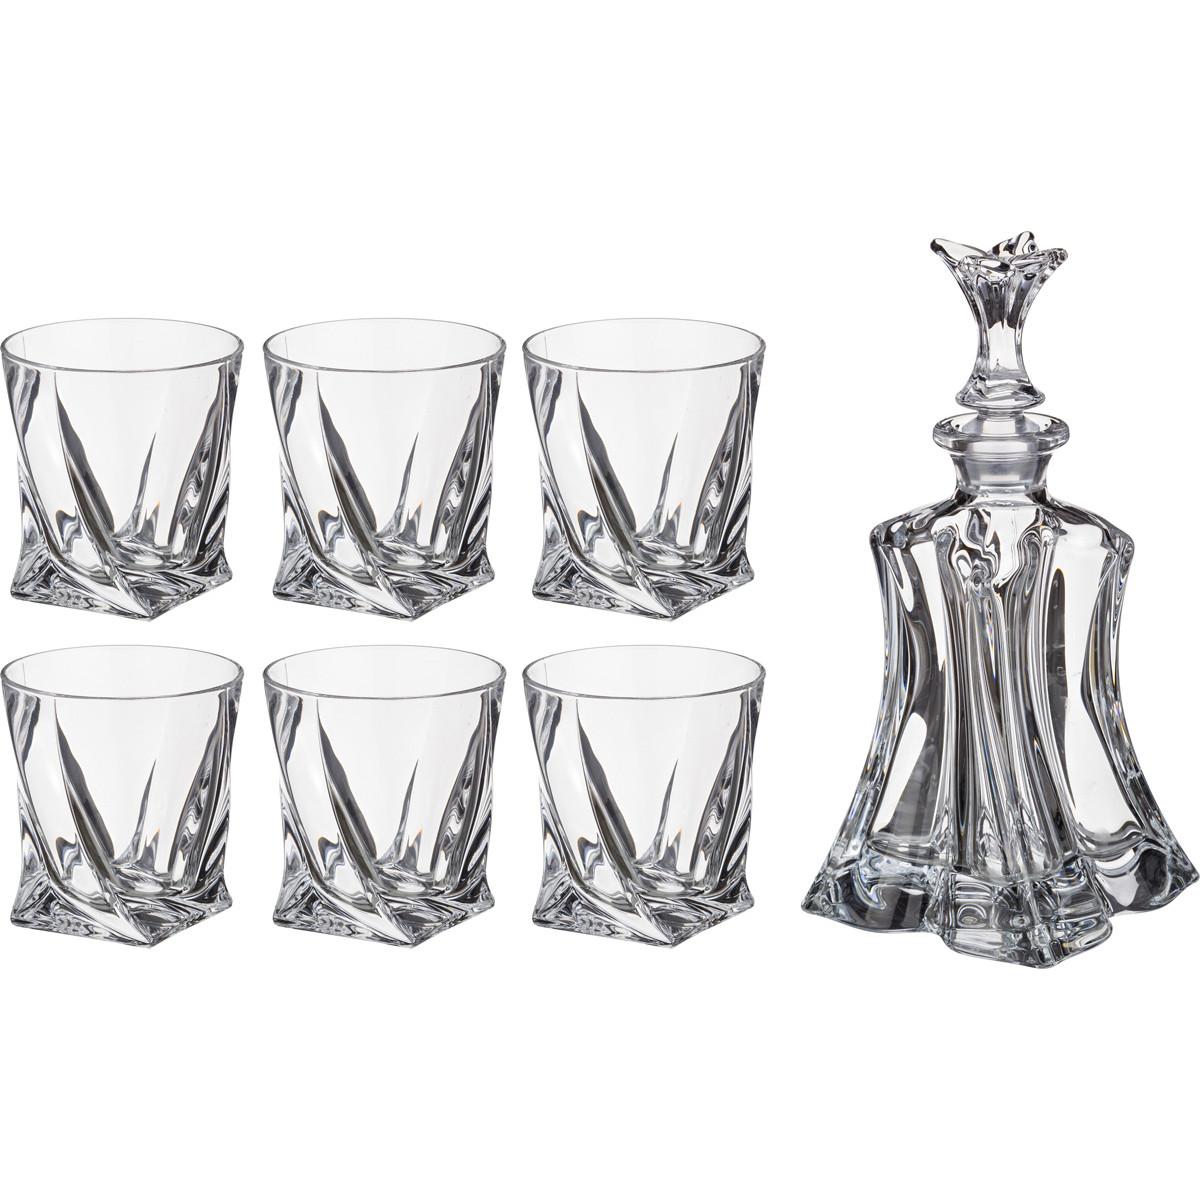 {} Crystalite Bohemia Набор для виски Lewin (Набор) набор стаканов rcr адажио 400 мл 6 шт